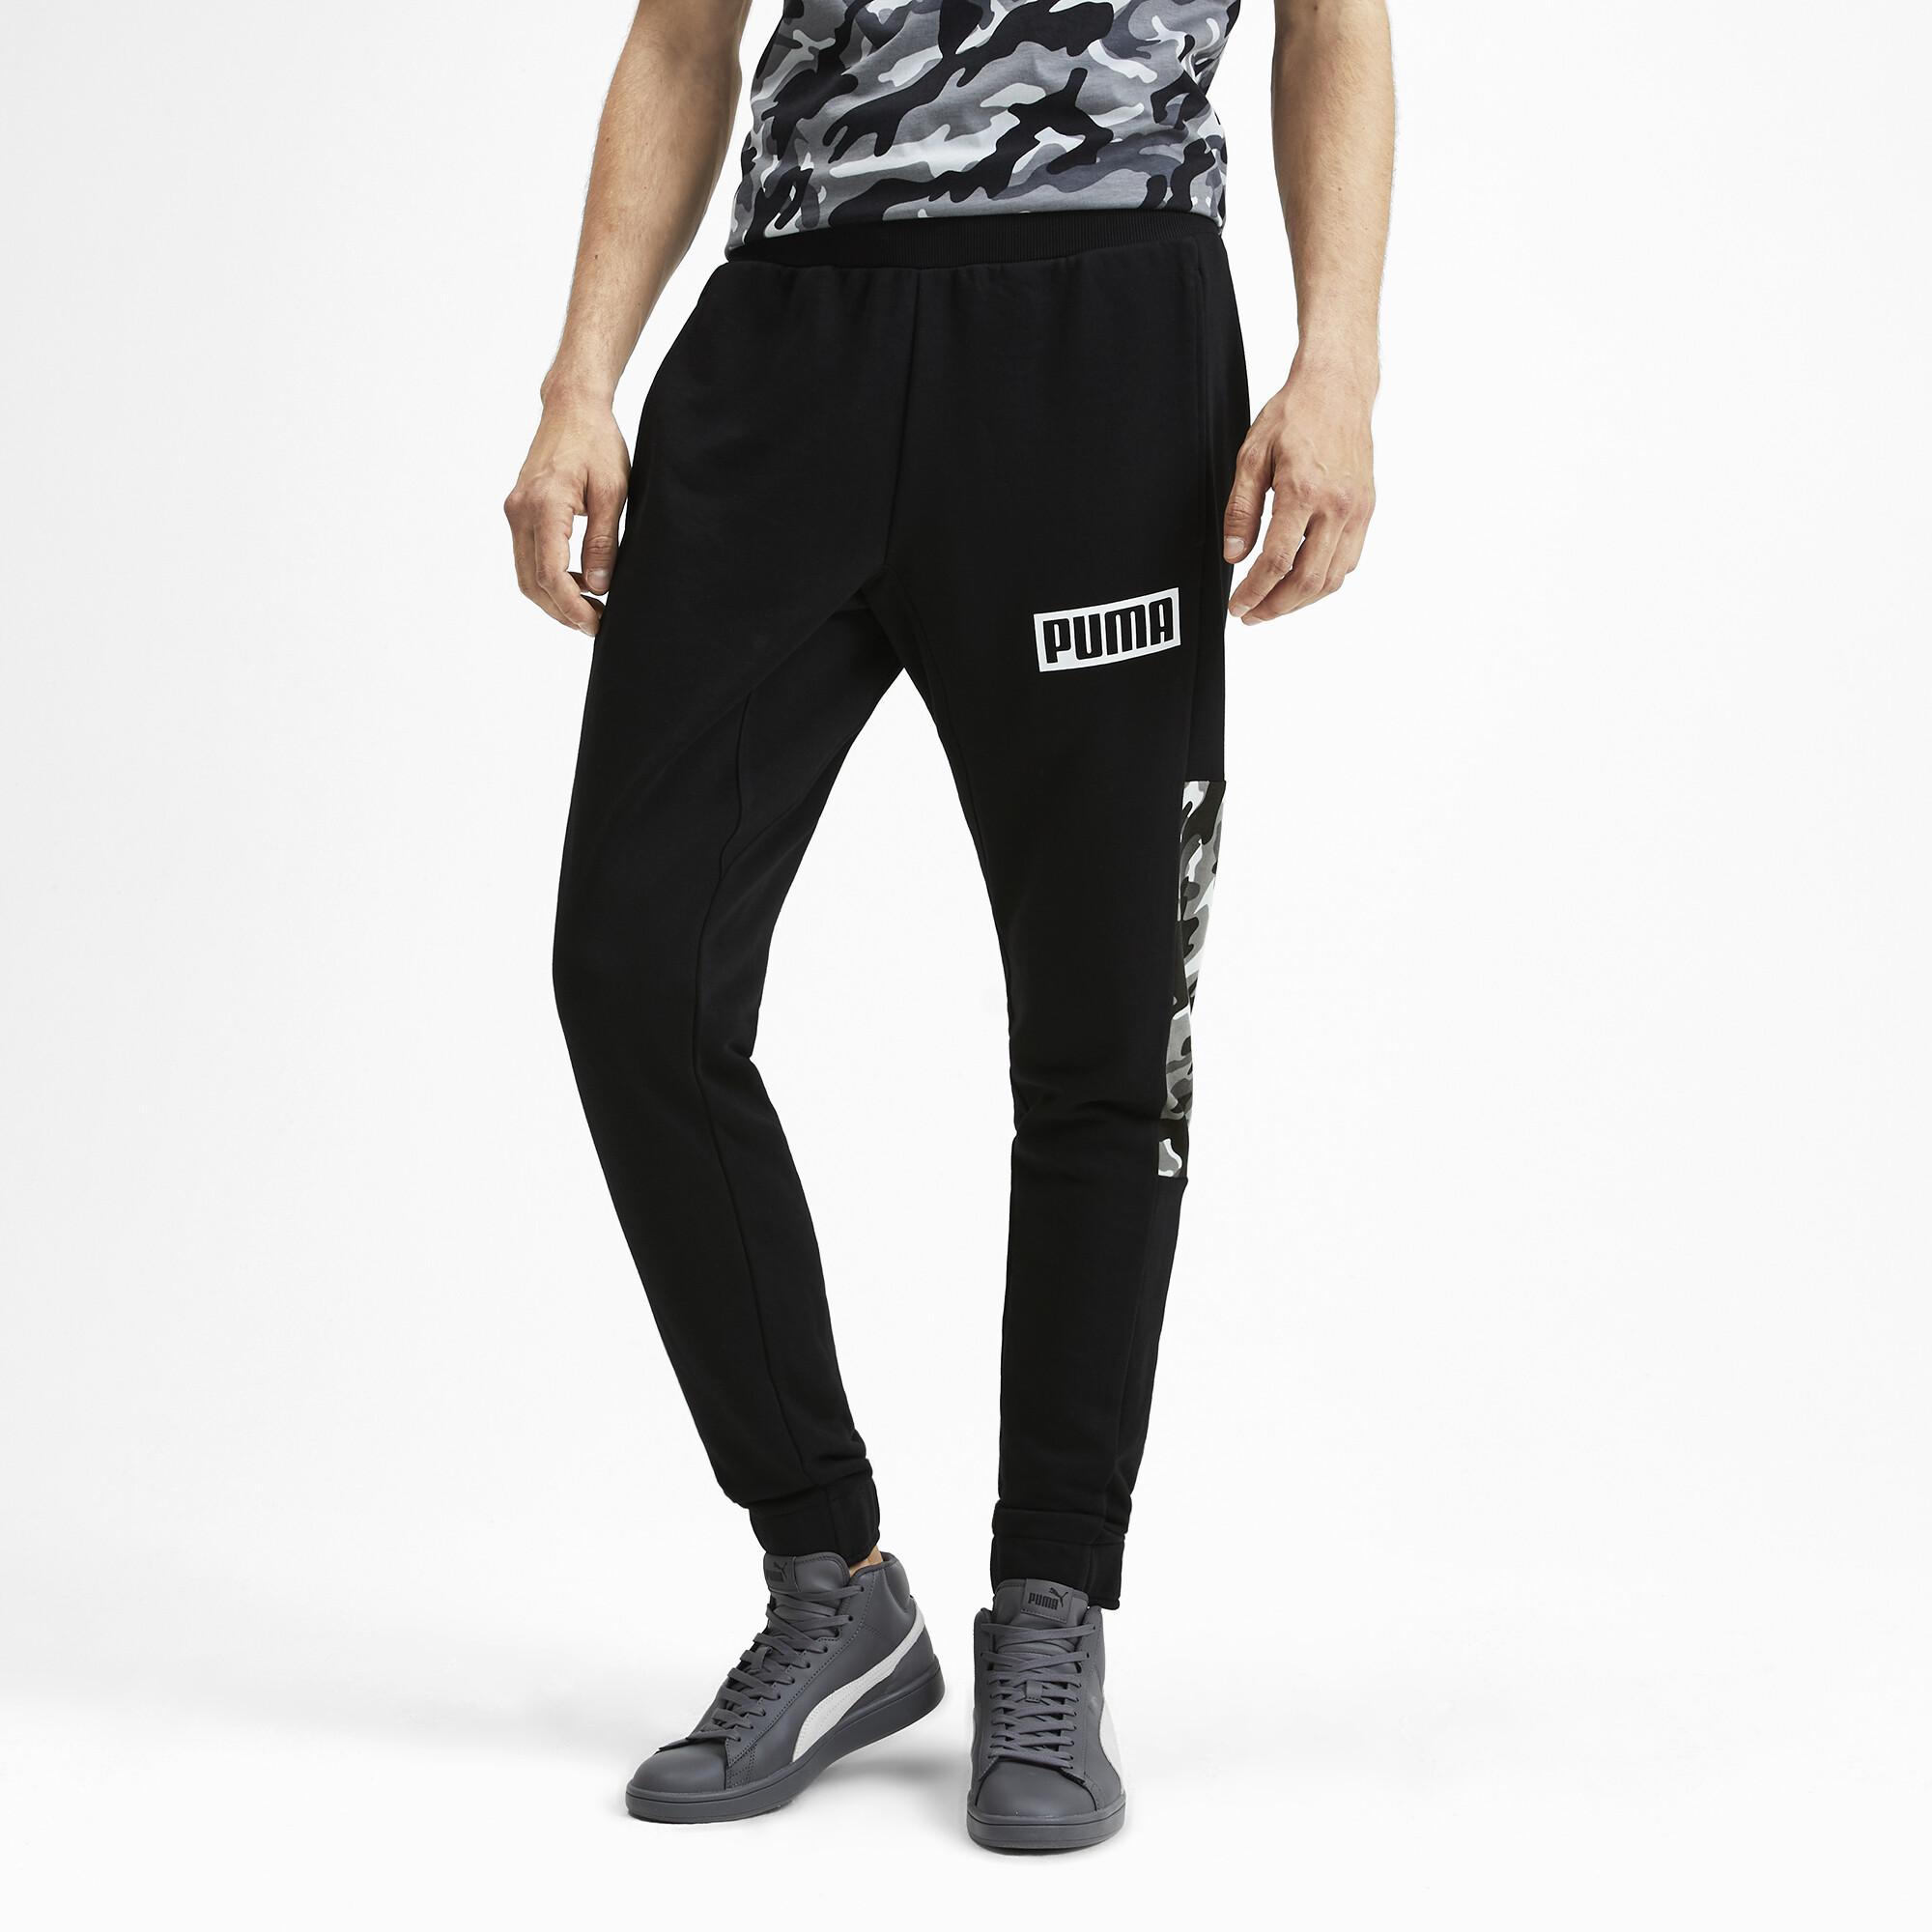 PUMA-Rebel-Camo-Men-039-s-Pants-Men-Knitted-Pants-Basics thumbnail 4